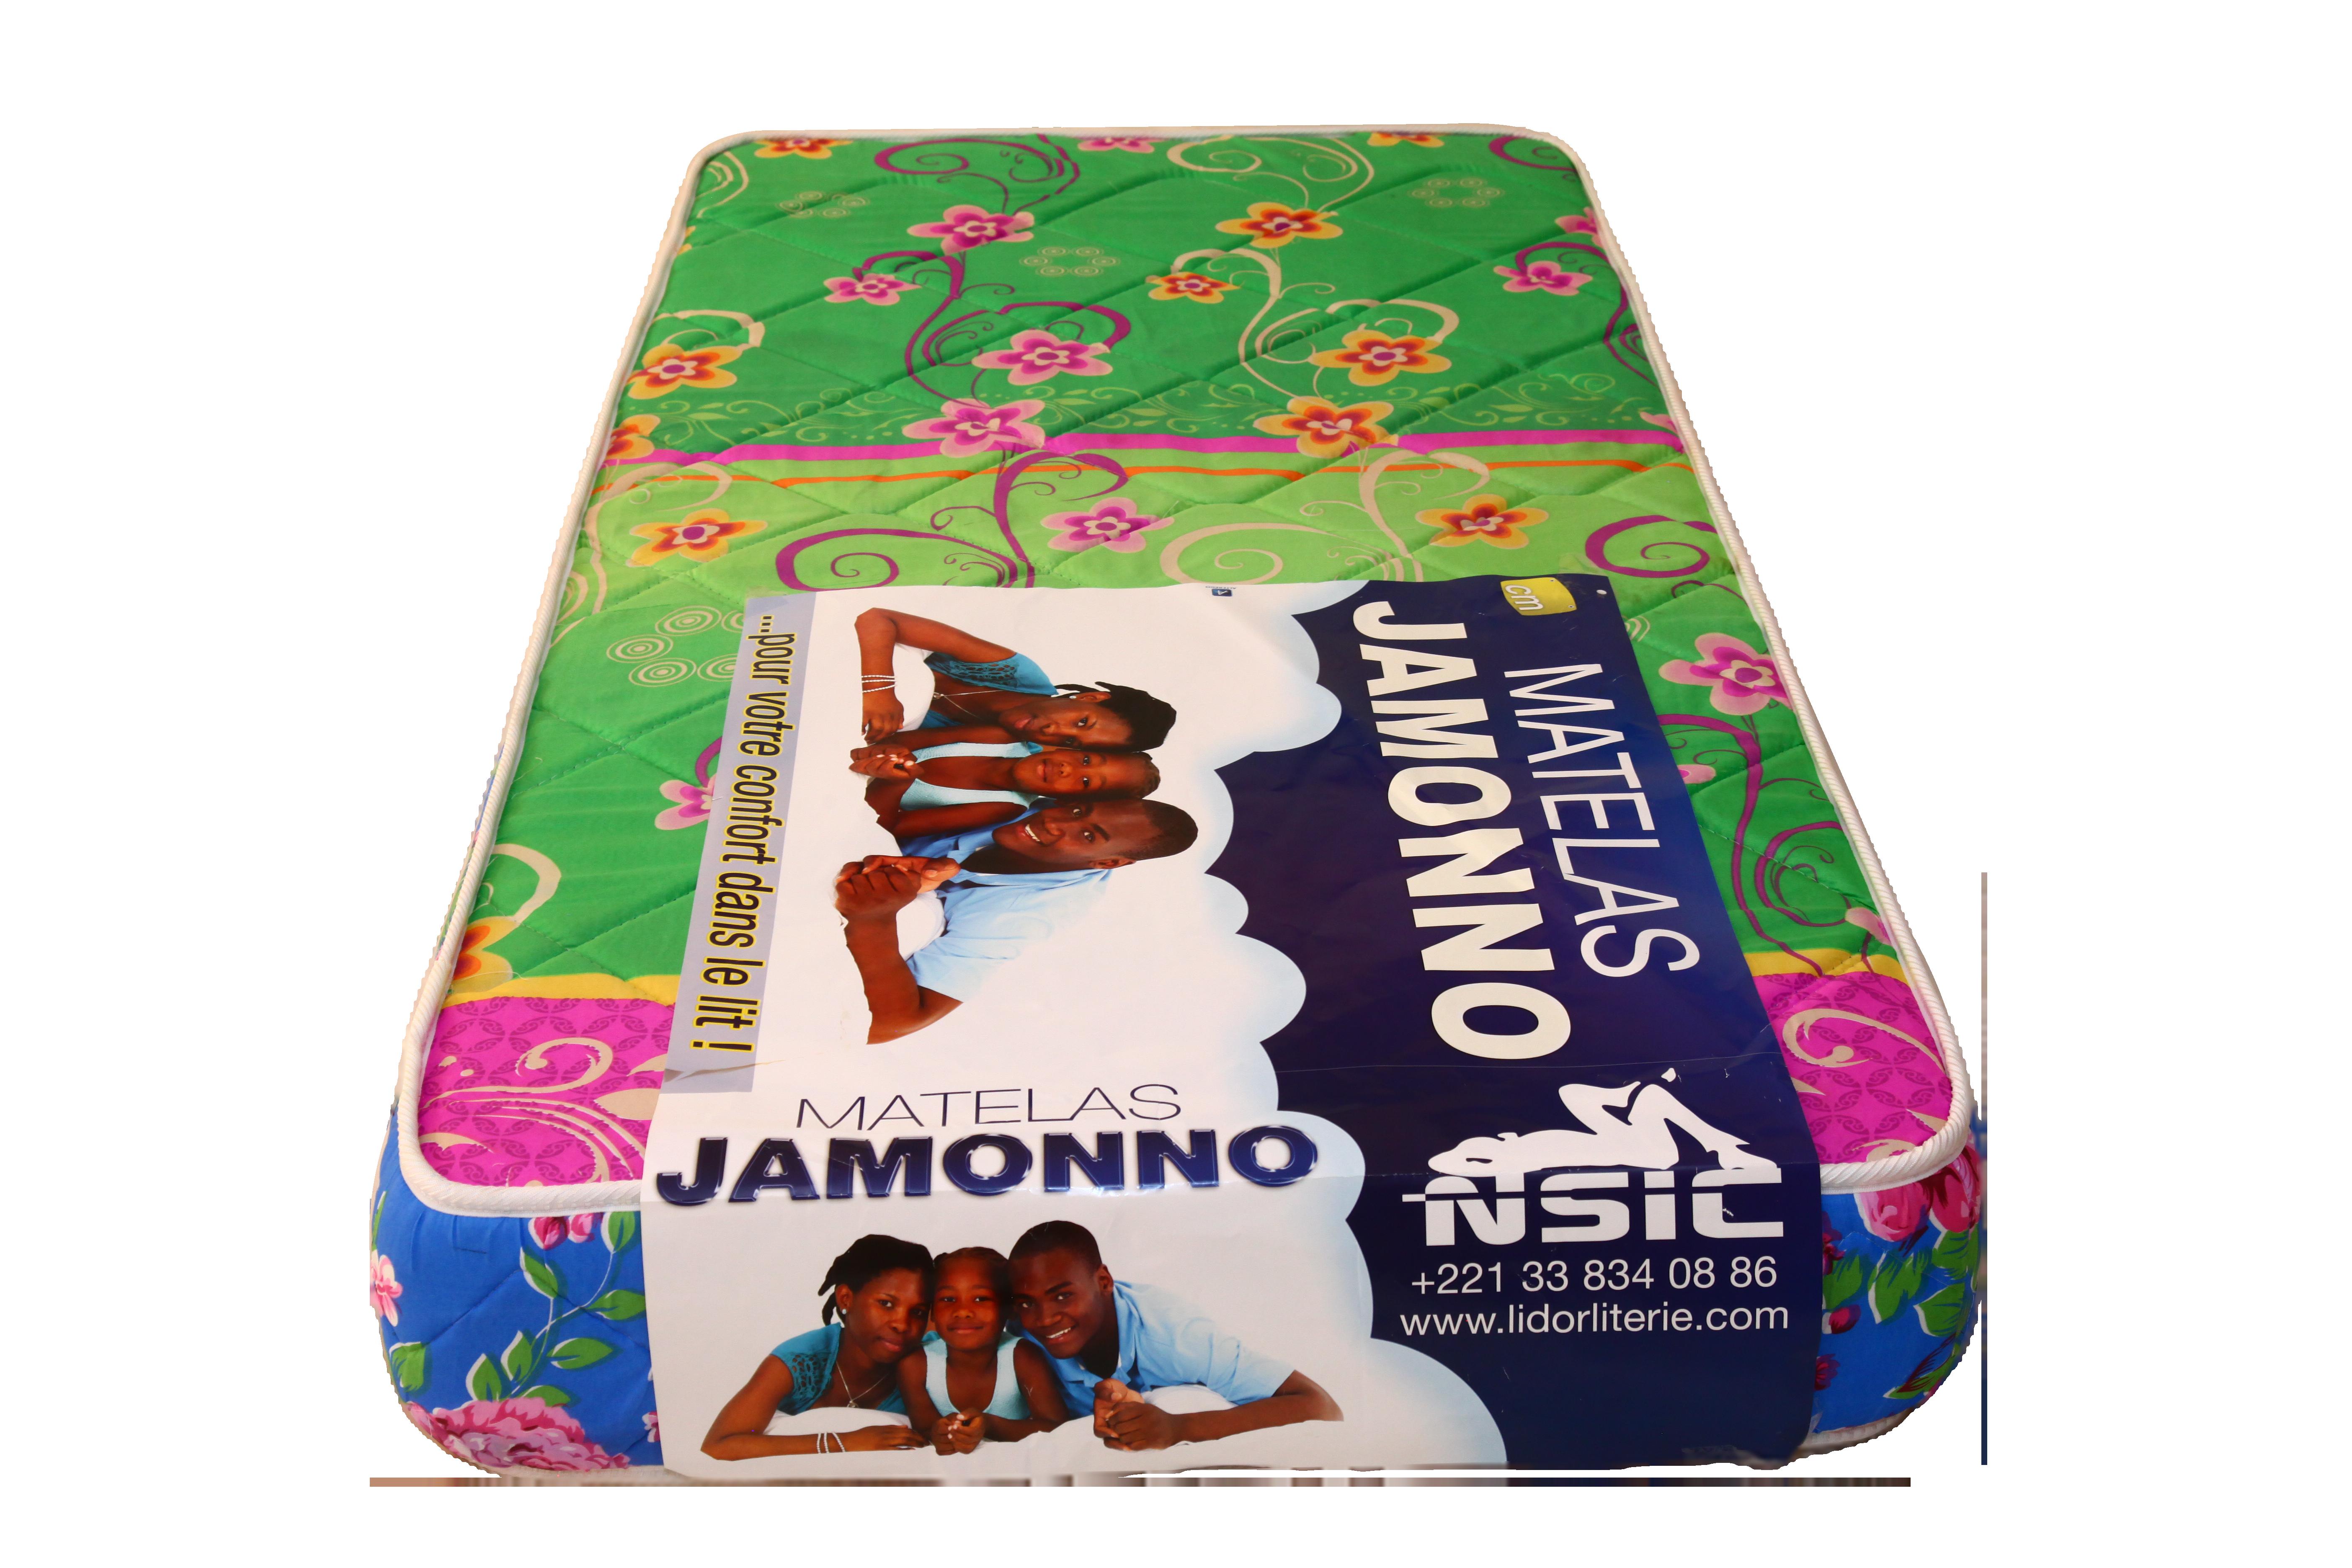 Mateals JAMONNO 190 X 090 X 18 CM(1)